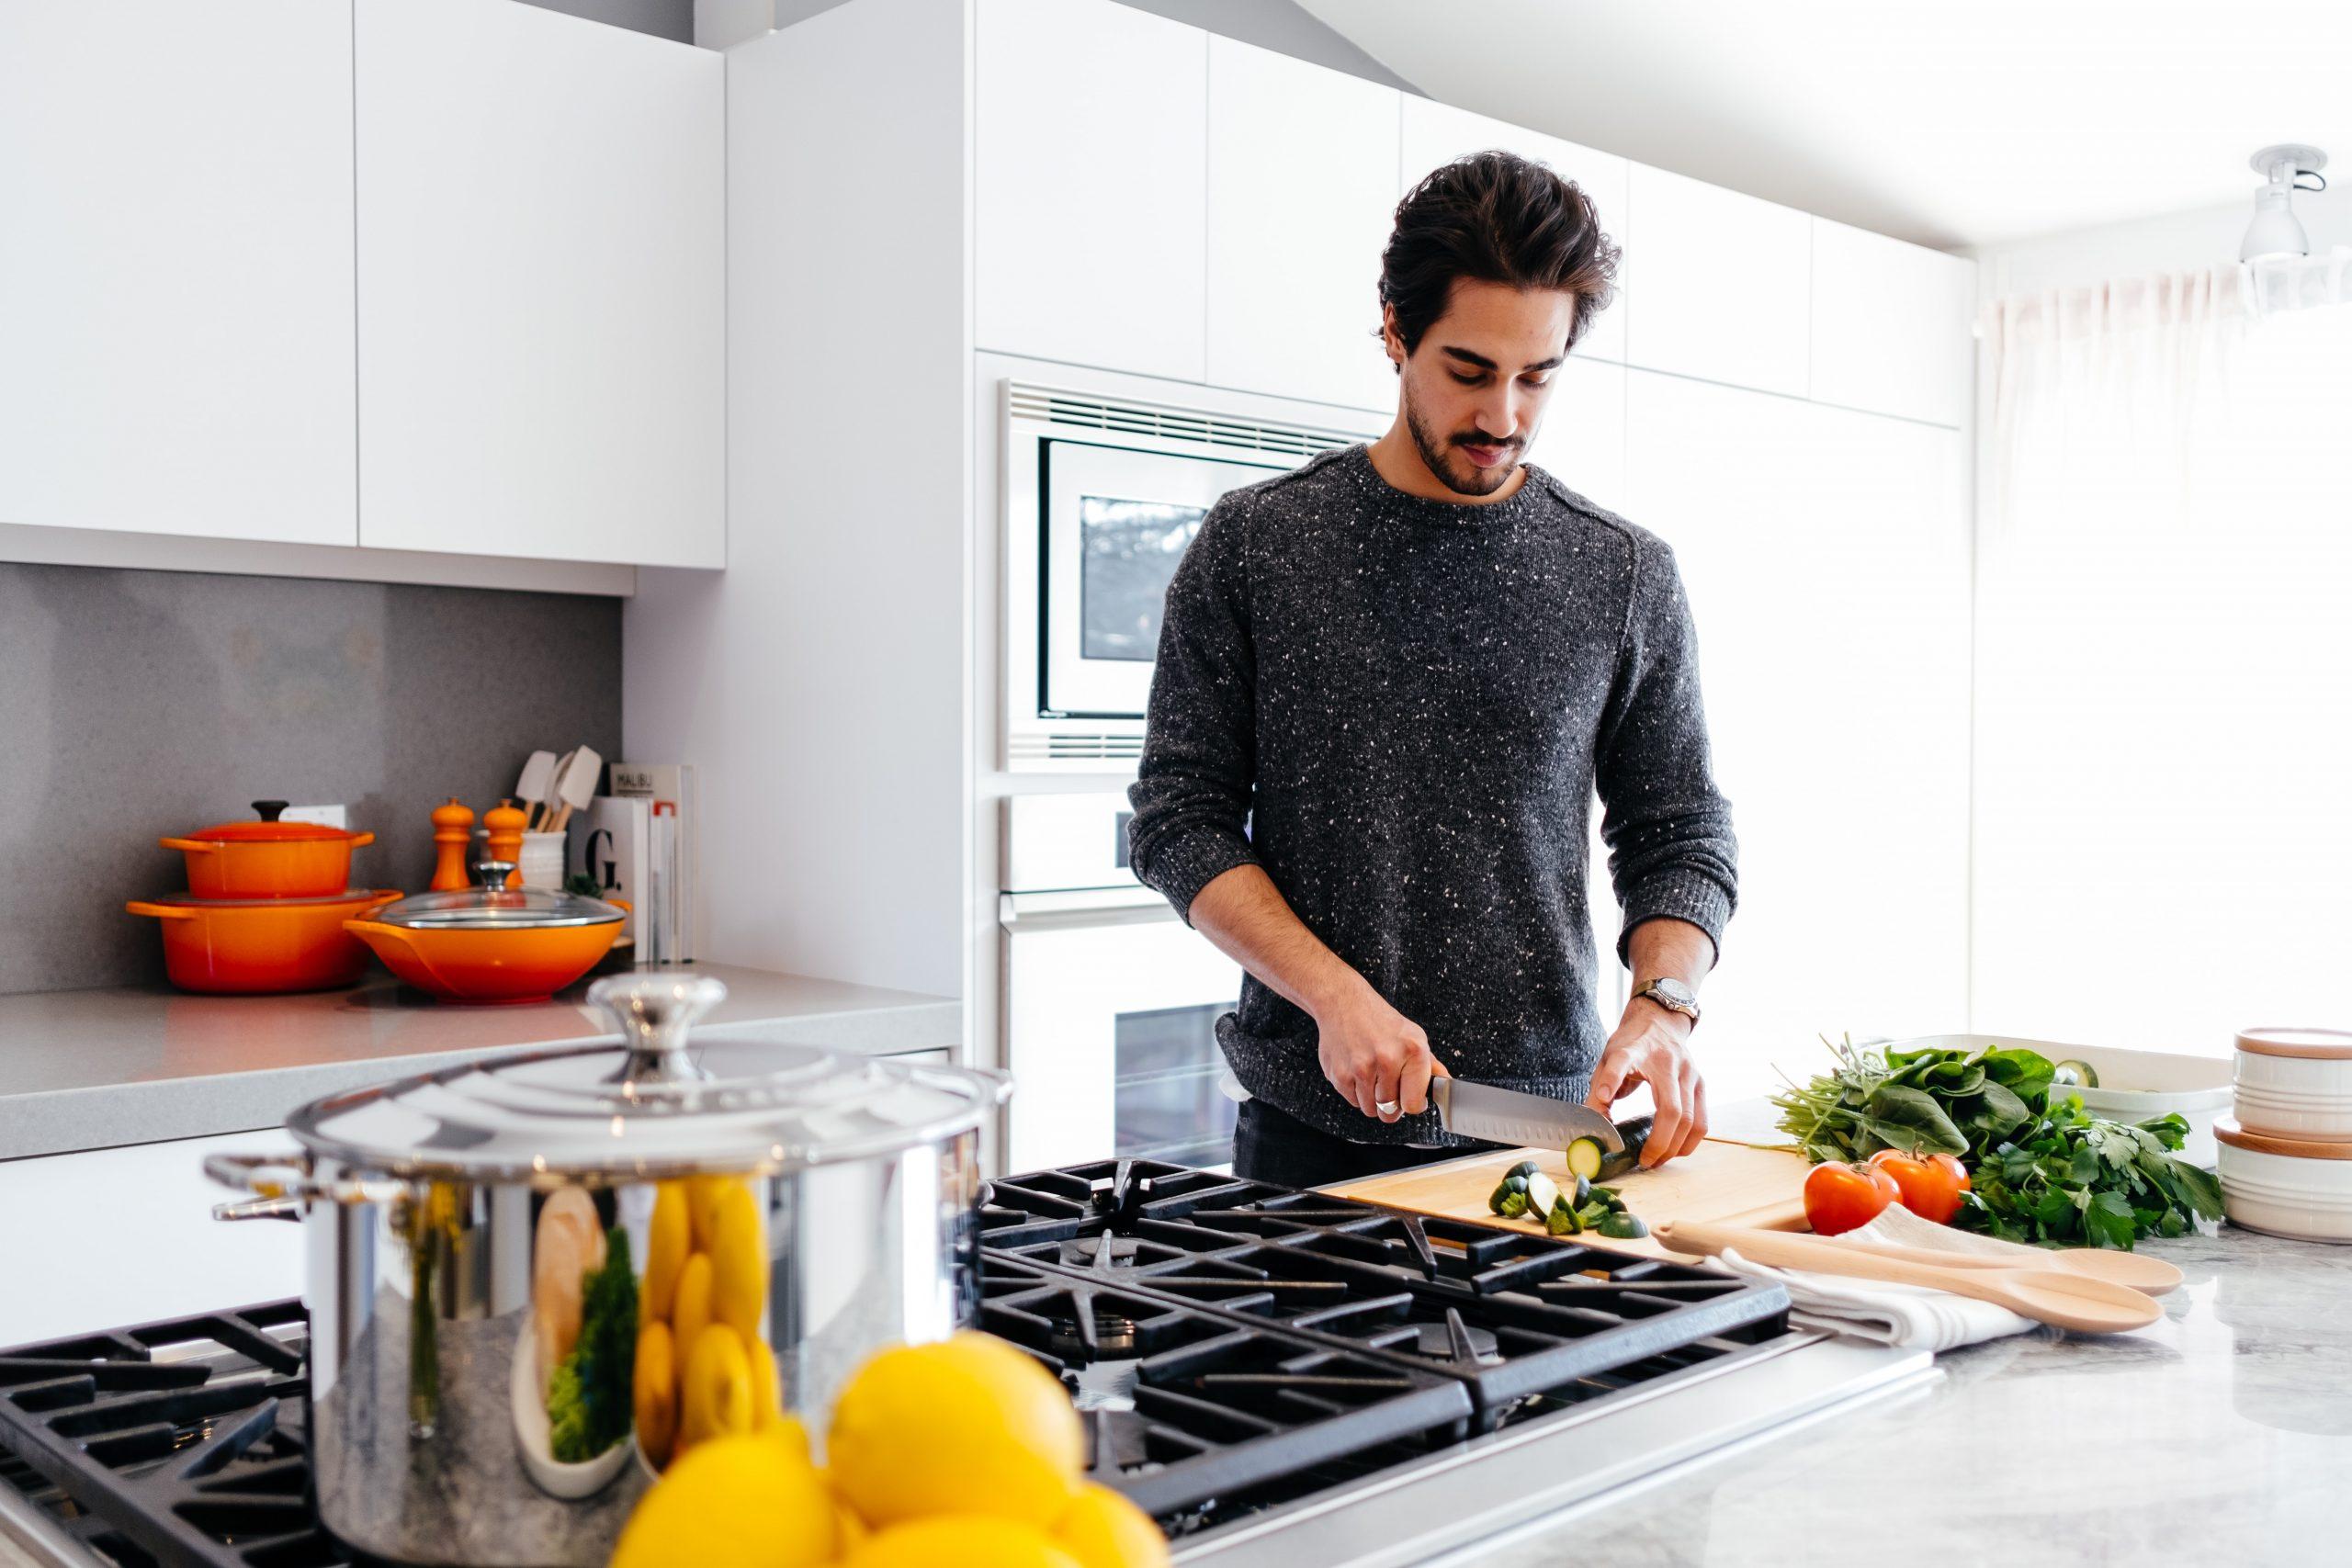 Man preparing food in a new kitchen